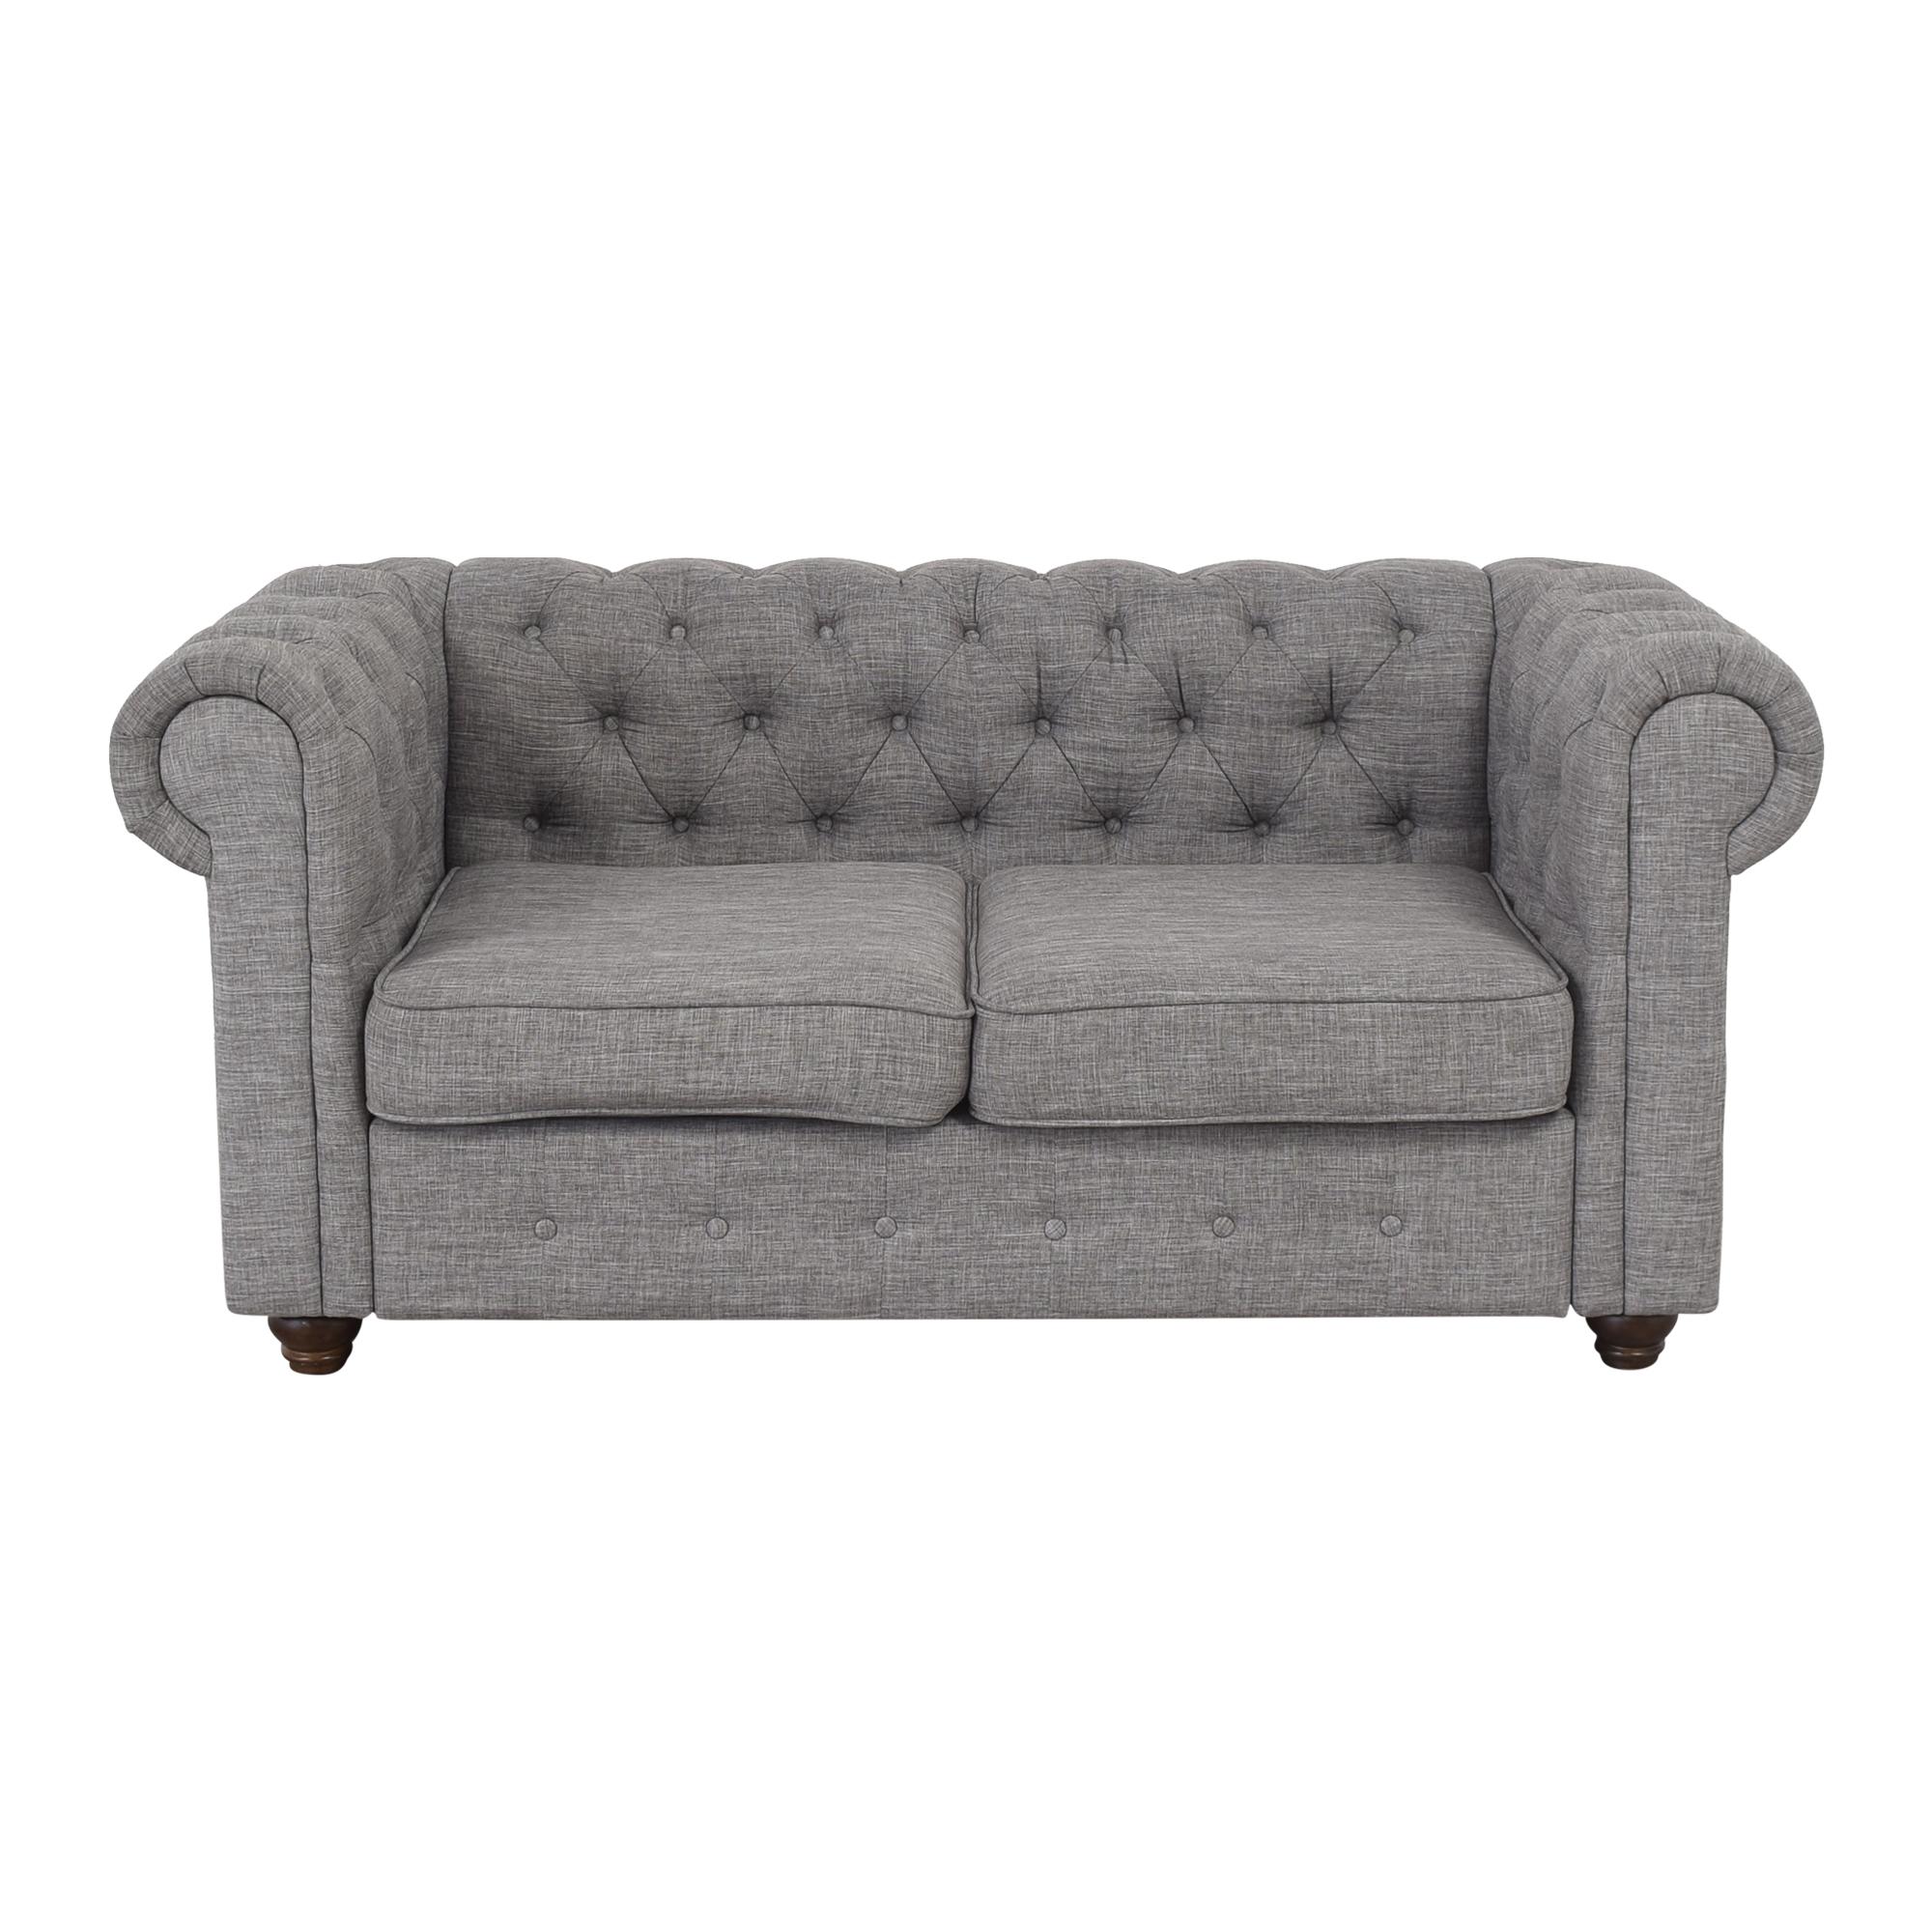 Alton Furniture Alton Furniture Gracia Chesterfield Loveseat